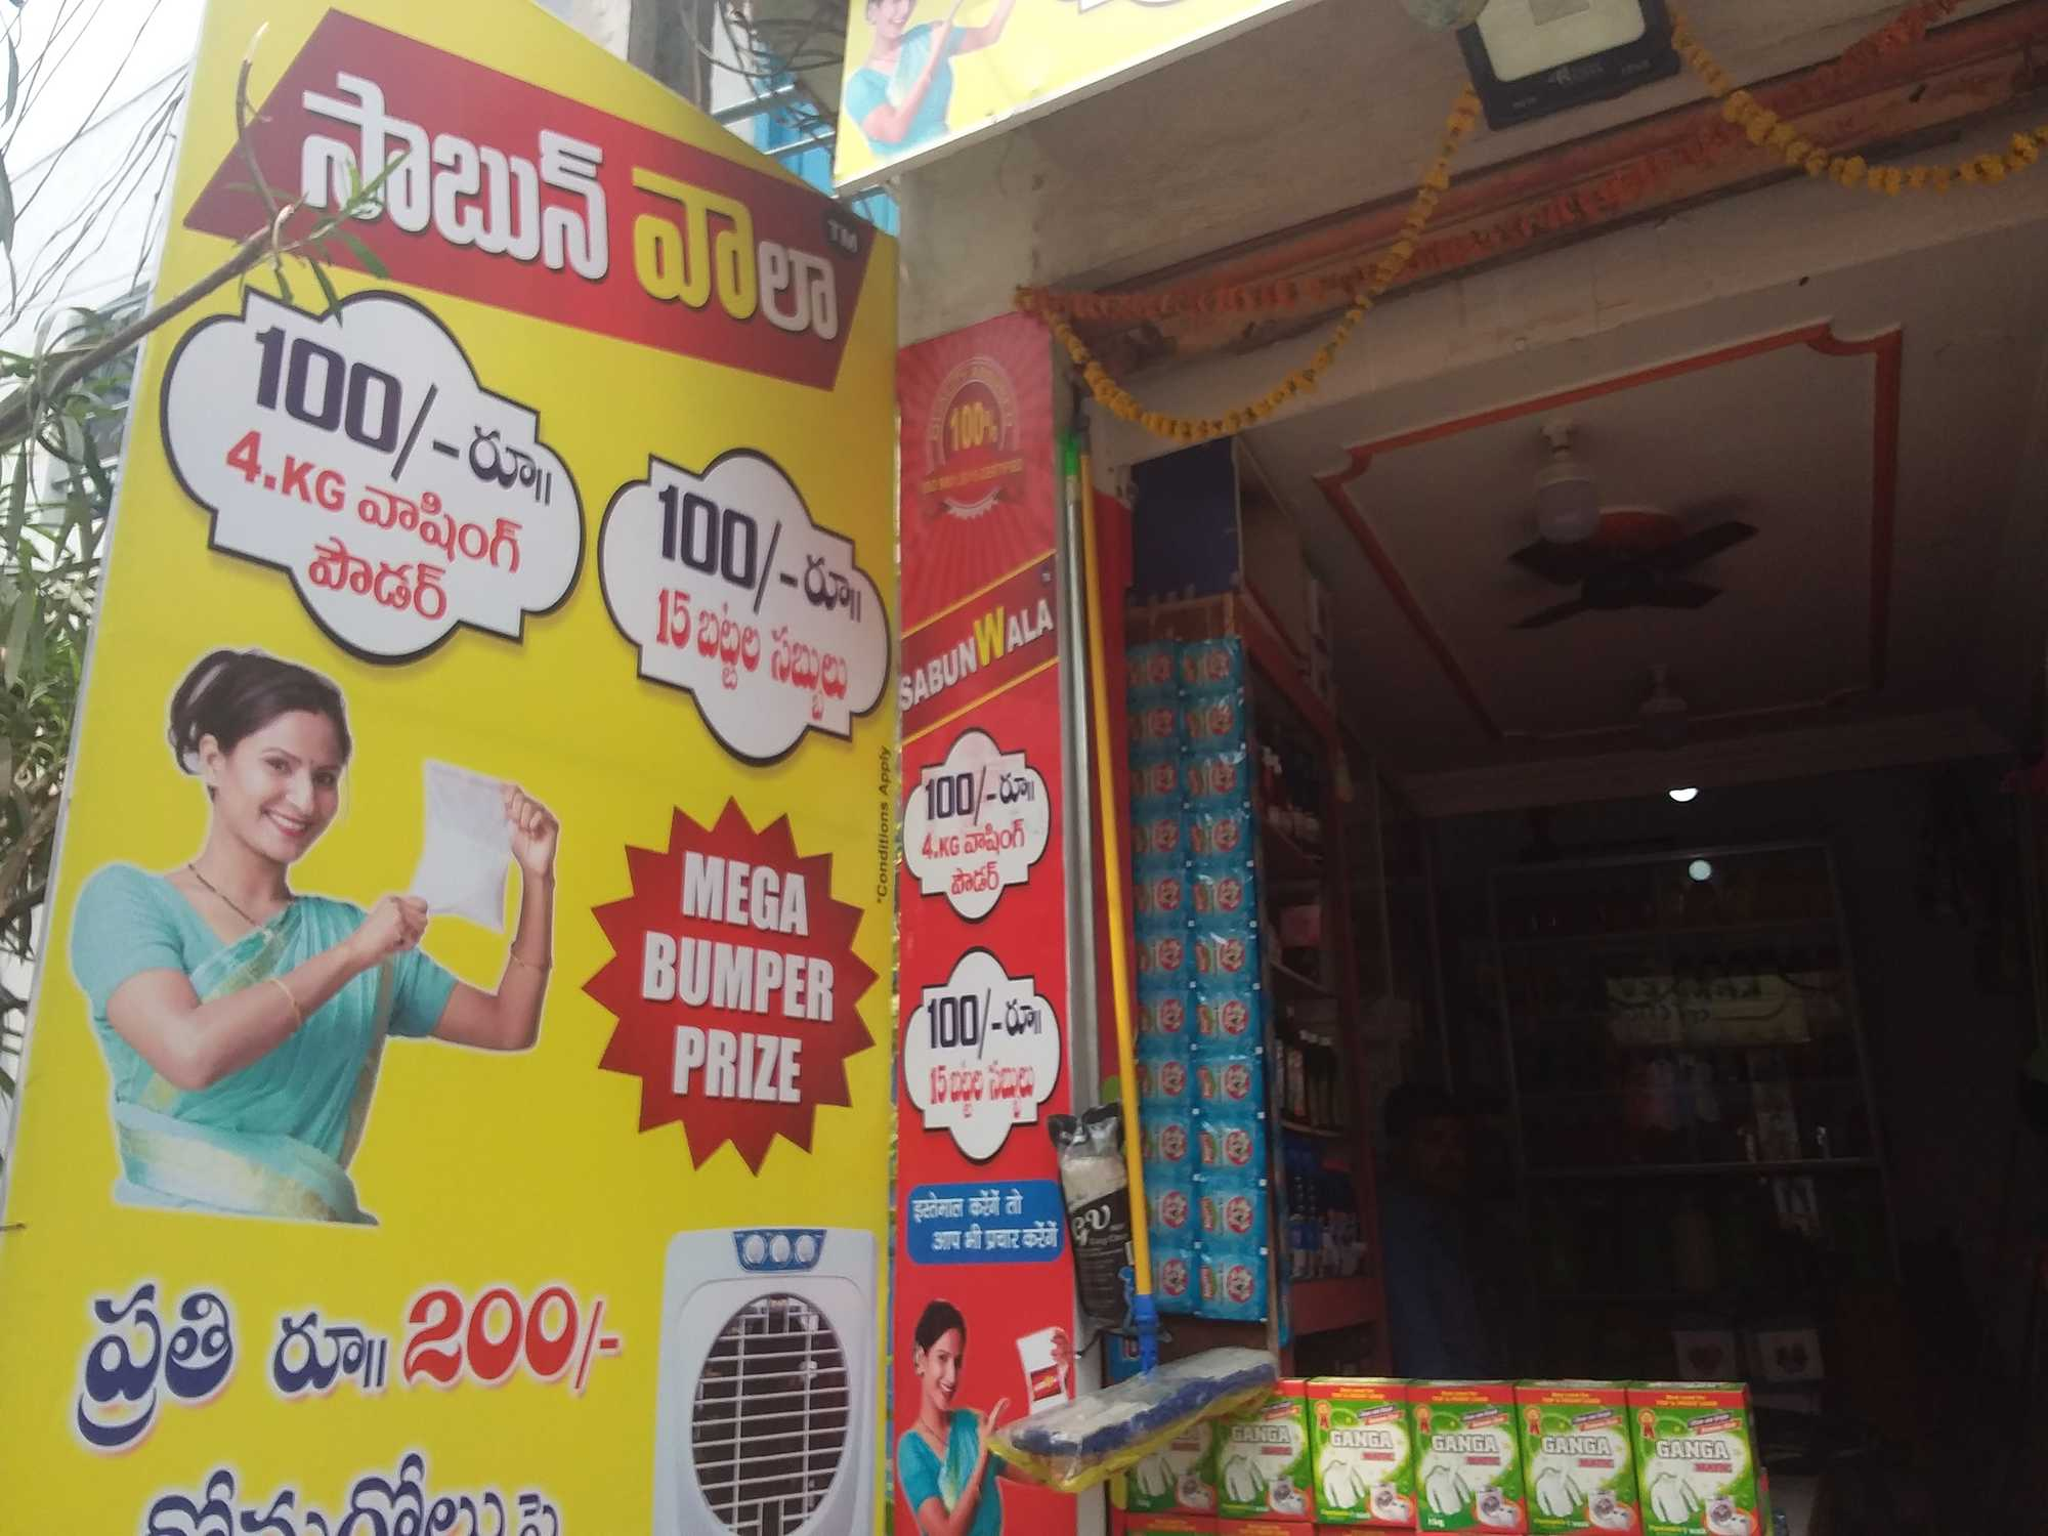 Top Phenyl Dealers in Warangal - Best Phenyl Suppliers